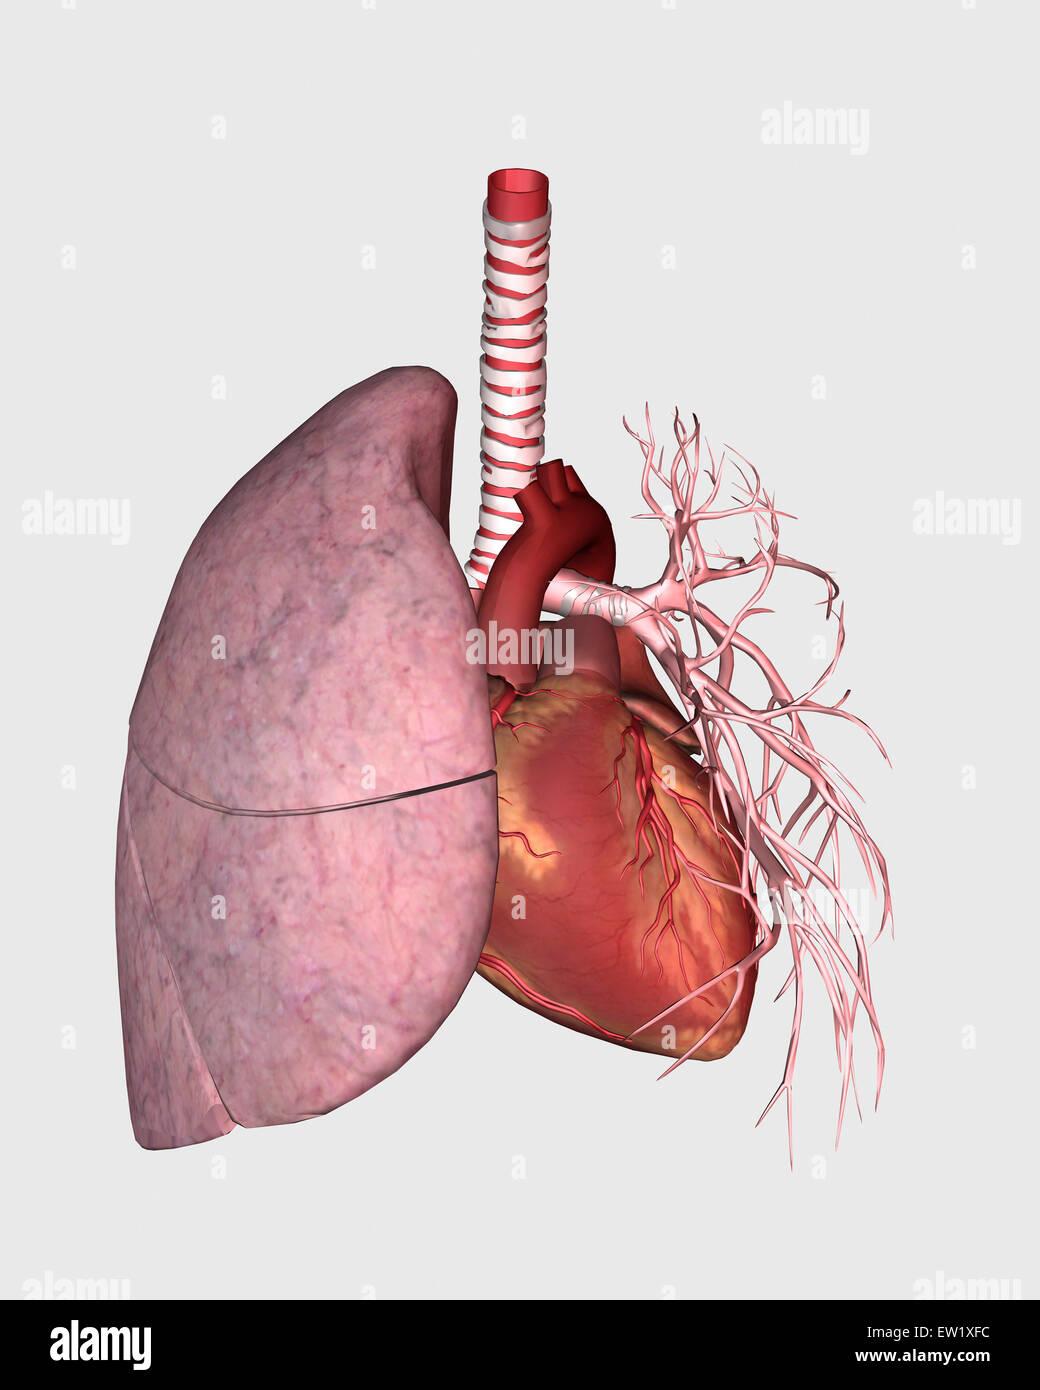 Pulmonary Circulation Of Human Heart And Lung Stock Photo 84250640